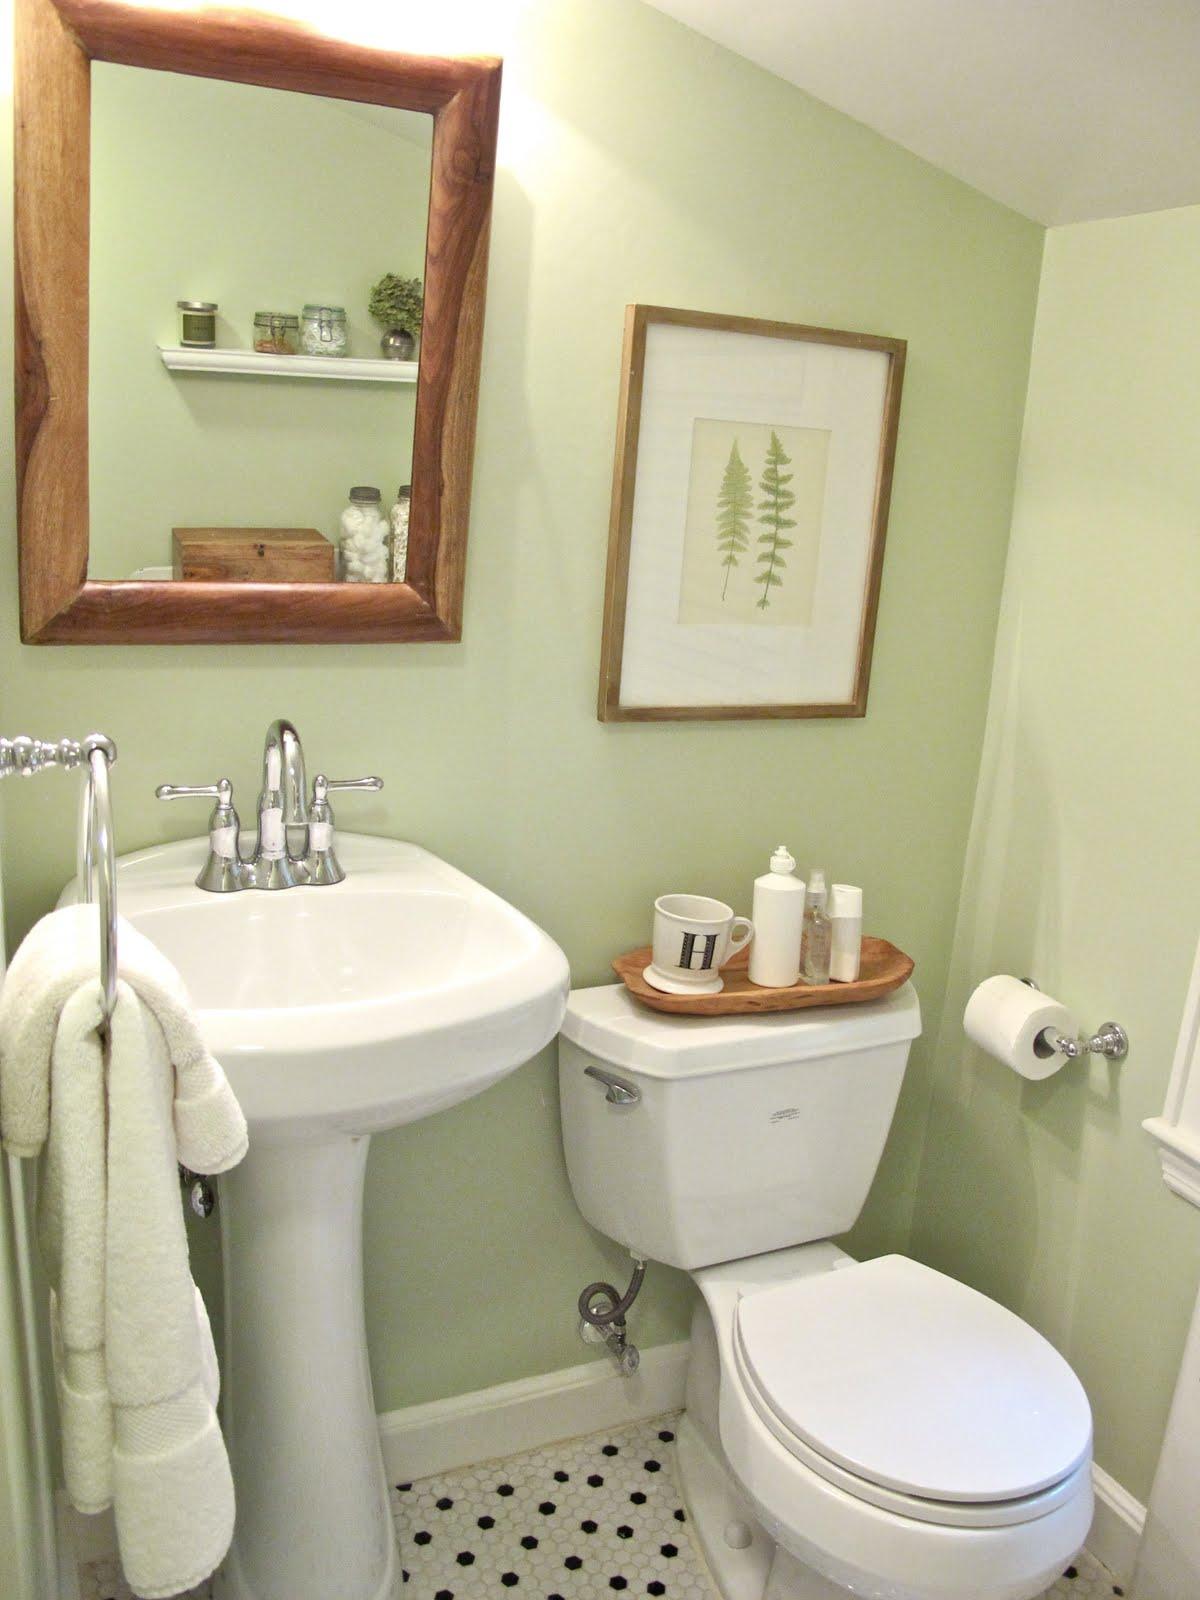 jenny steffens hobick bathroom redo pinterest challenge